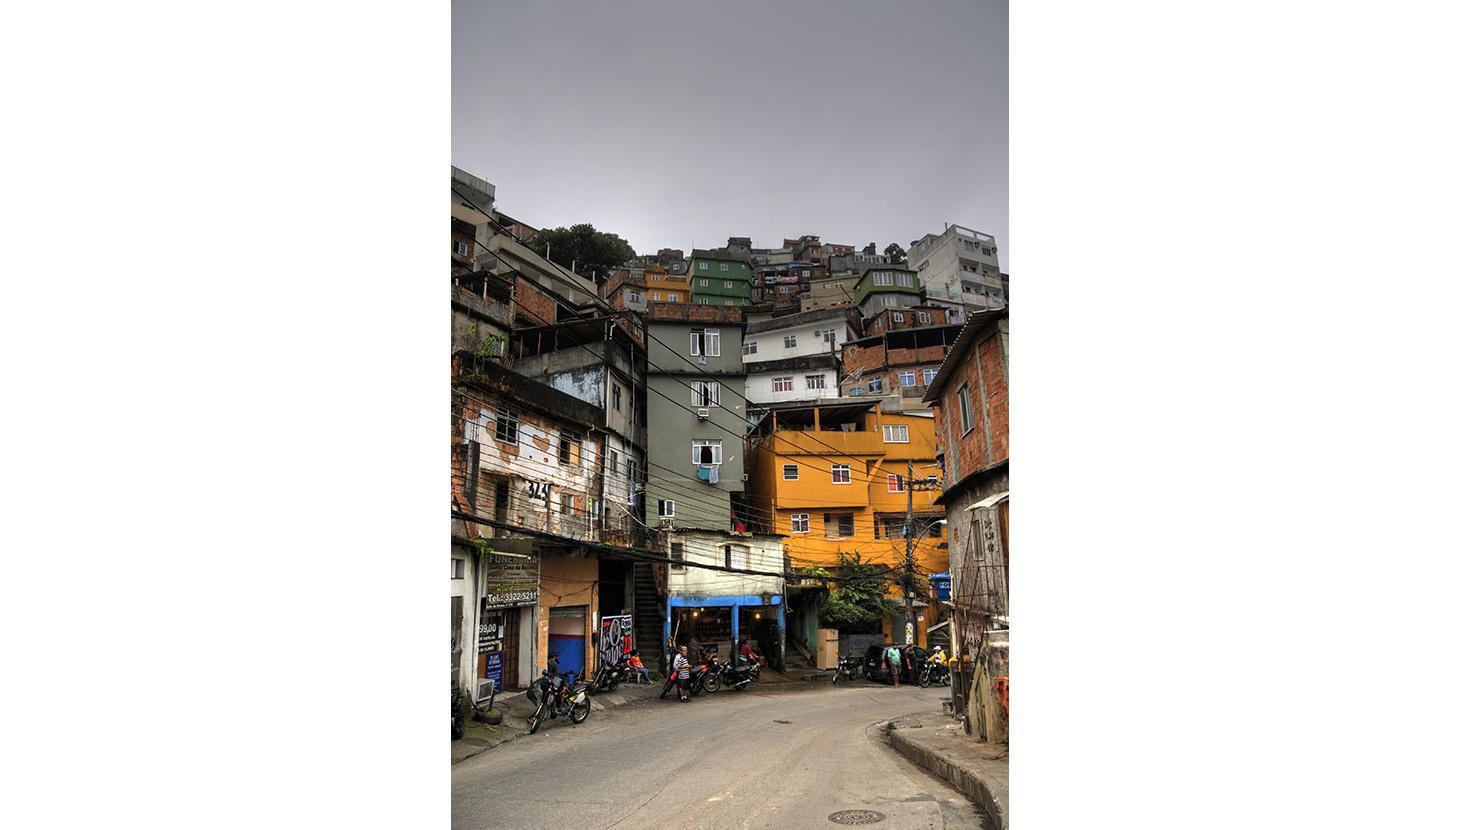 rio-slums-mariusz-kluzniak-2 (1)